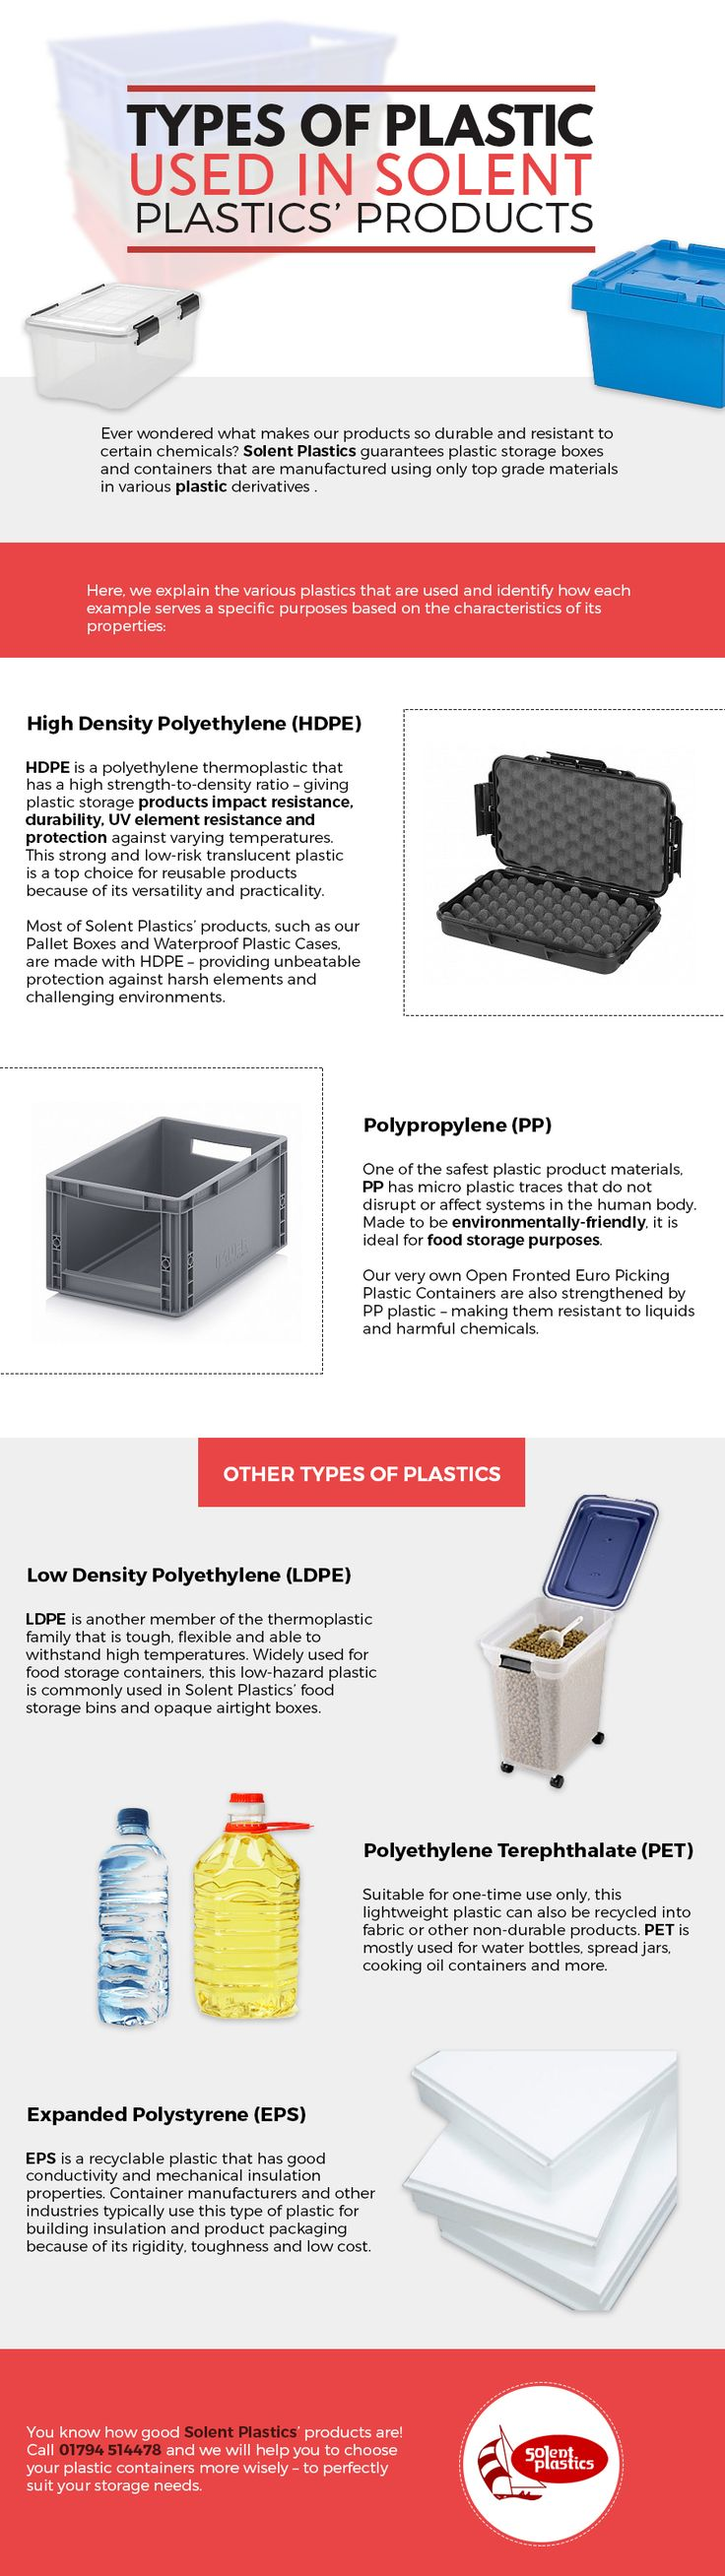 Types of Plastic Used in Solent Plastics Products...